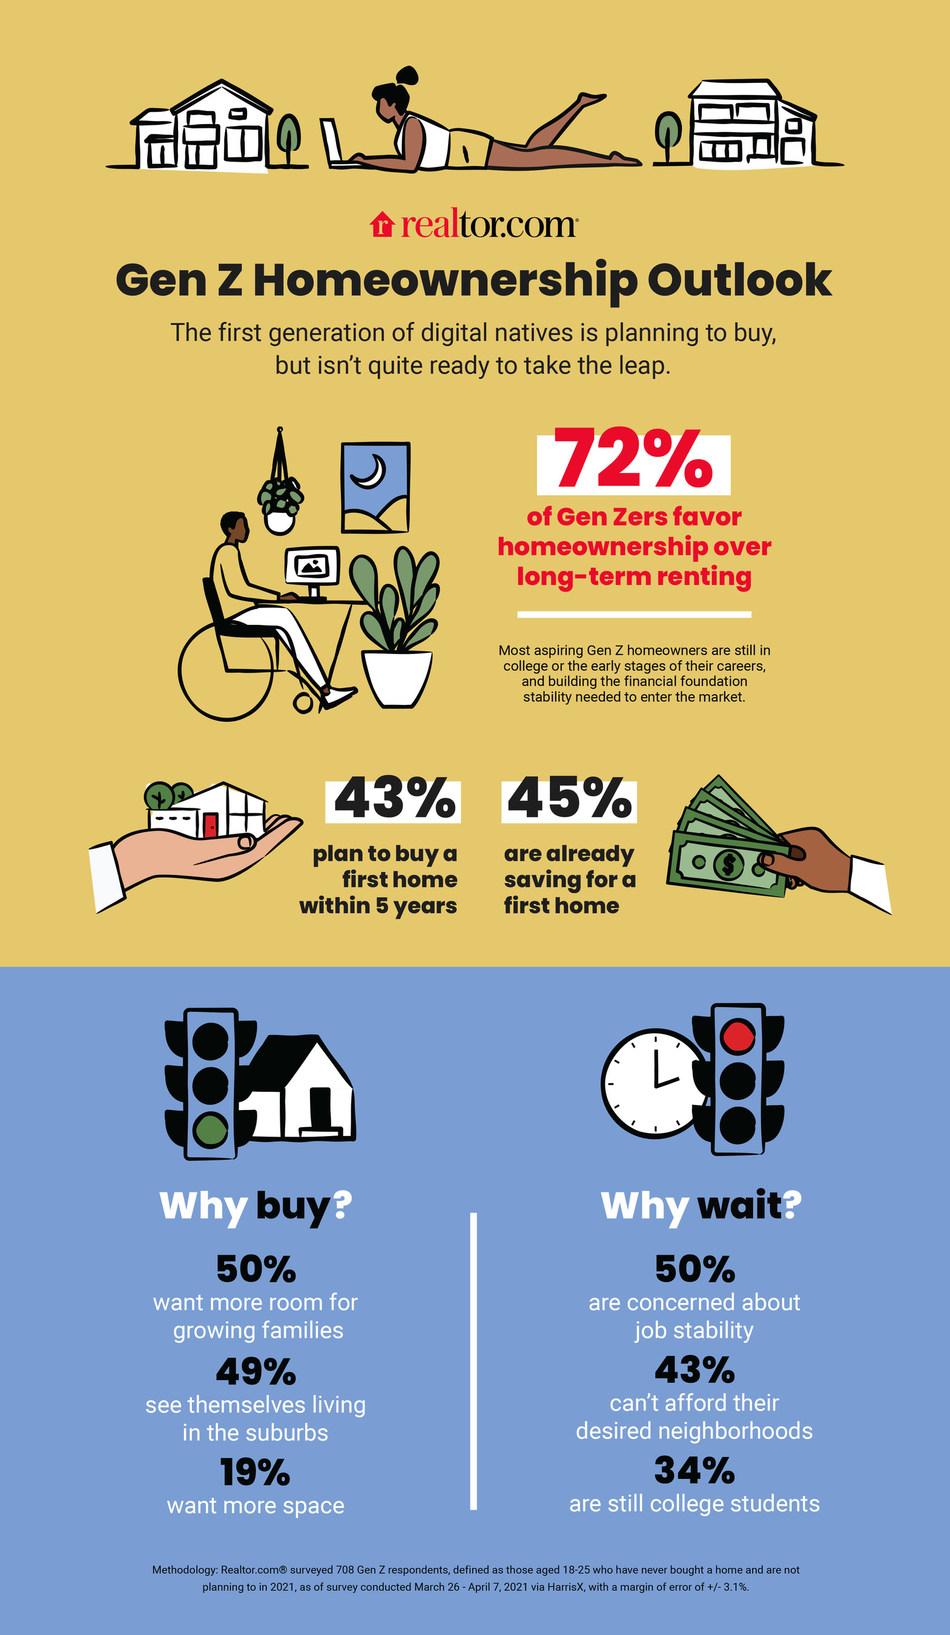 Infographic - Realtor.com Gen Z Homeownership Outlook